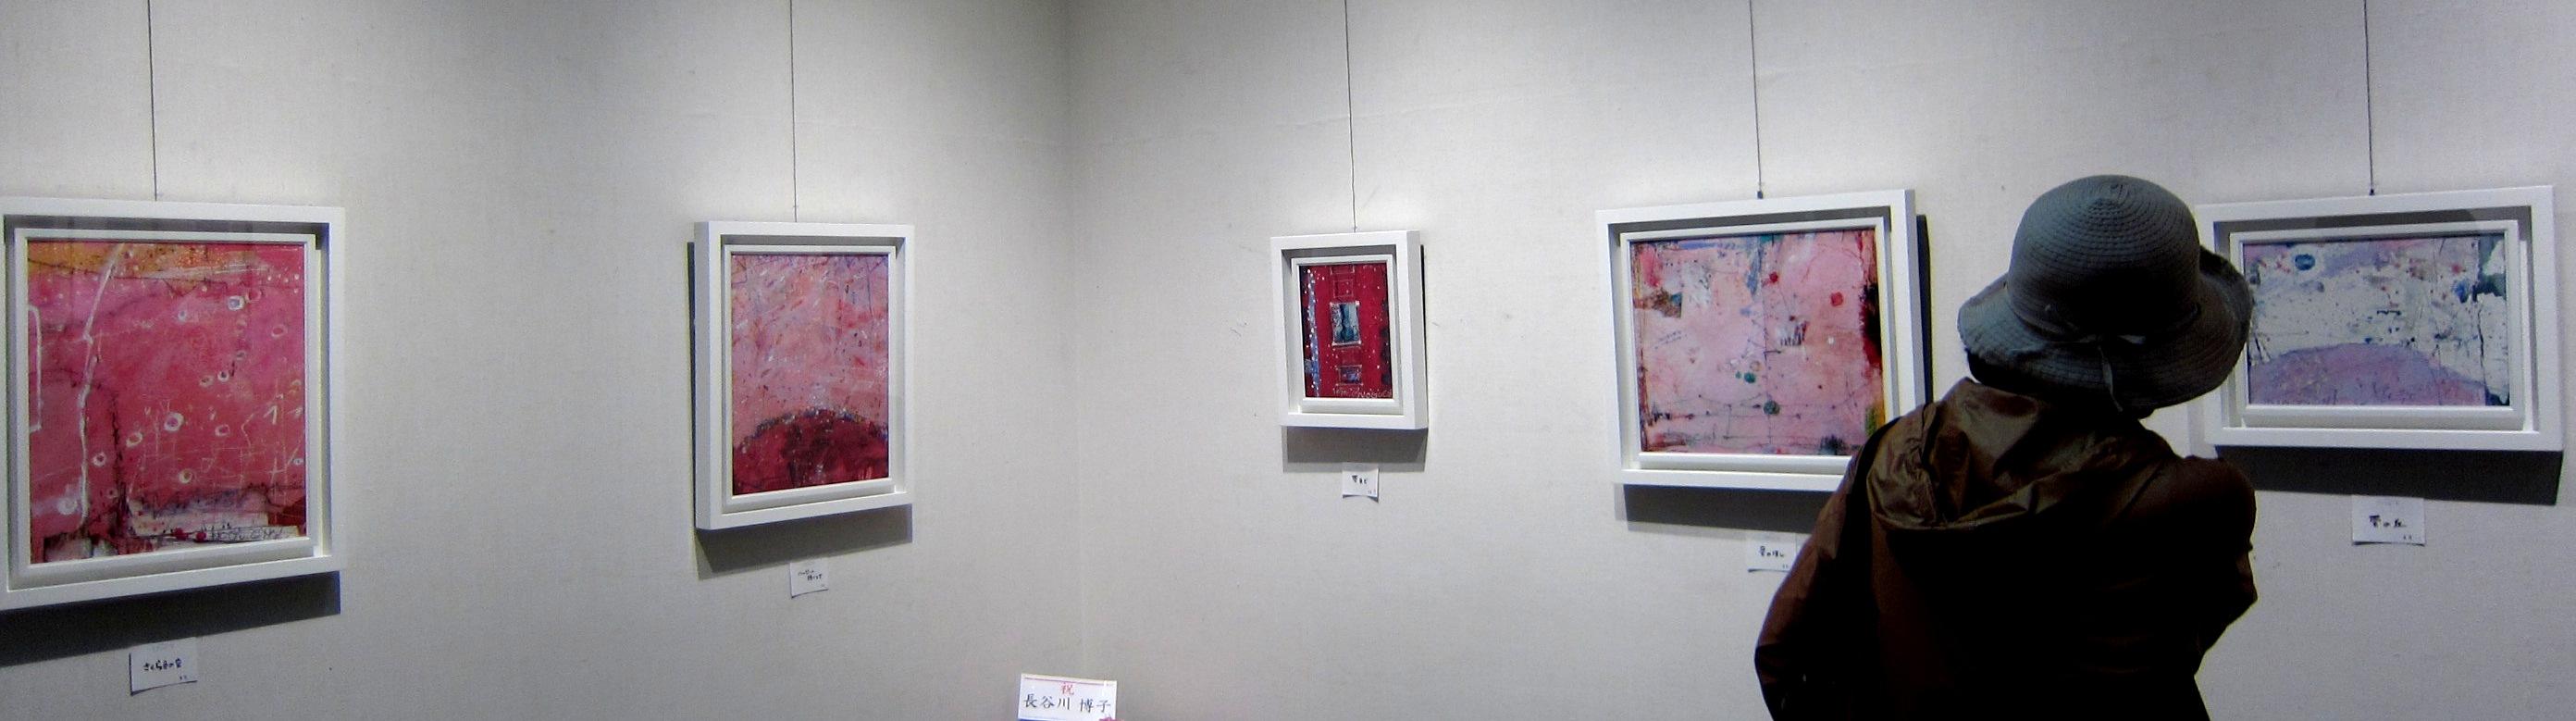 2384)「野口秀子個展(道展会員) 2014」 スカイホール 終了・6月17日(火)~6月22日(日)_f0126829_1405720.jpg